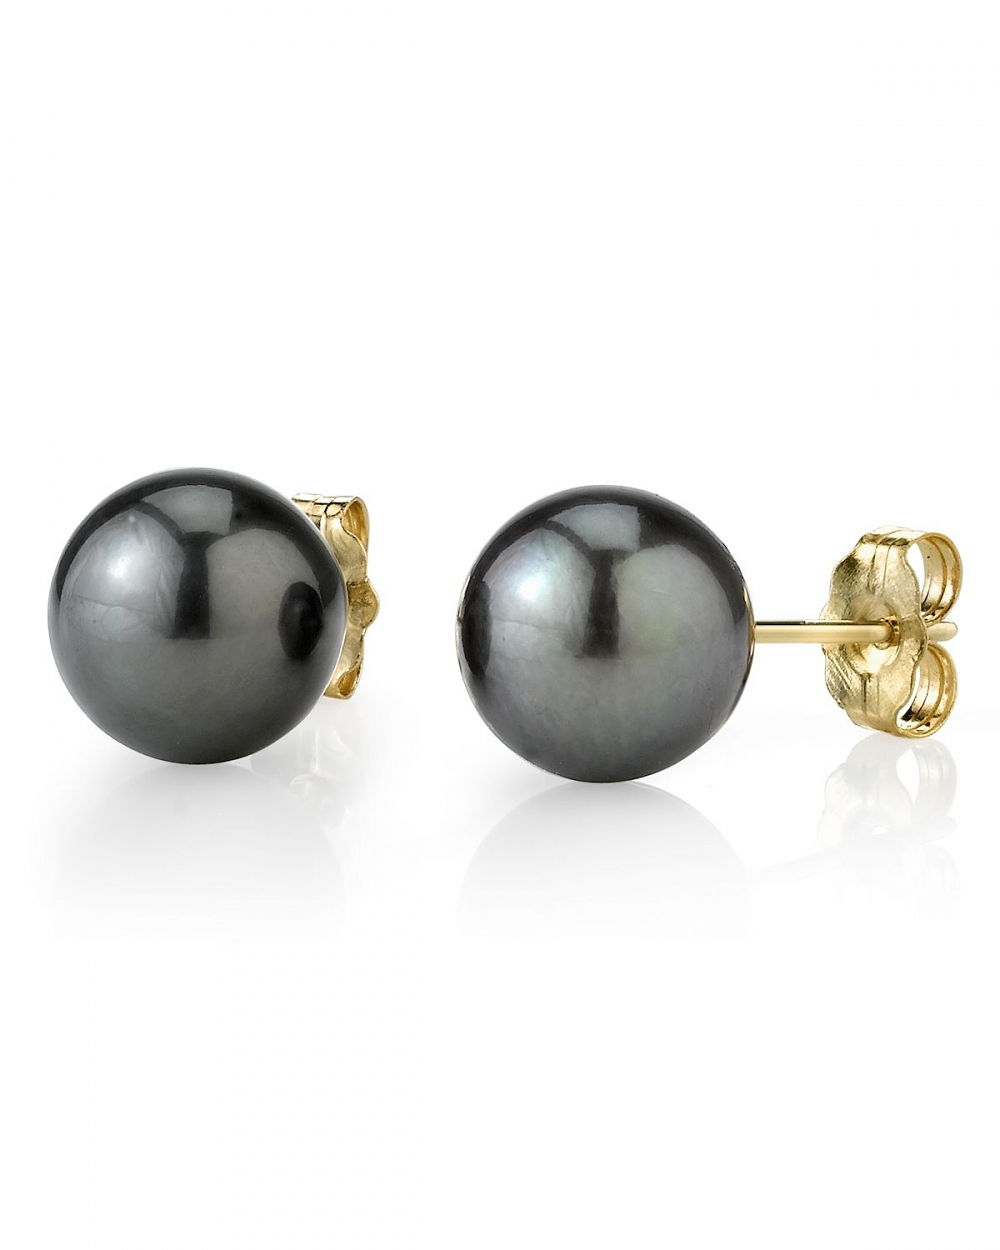 12mm tahitian south sea pearl stud earrings various colors